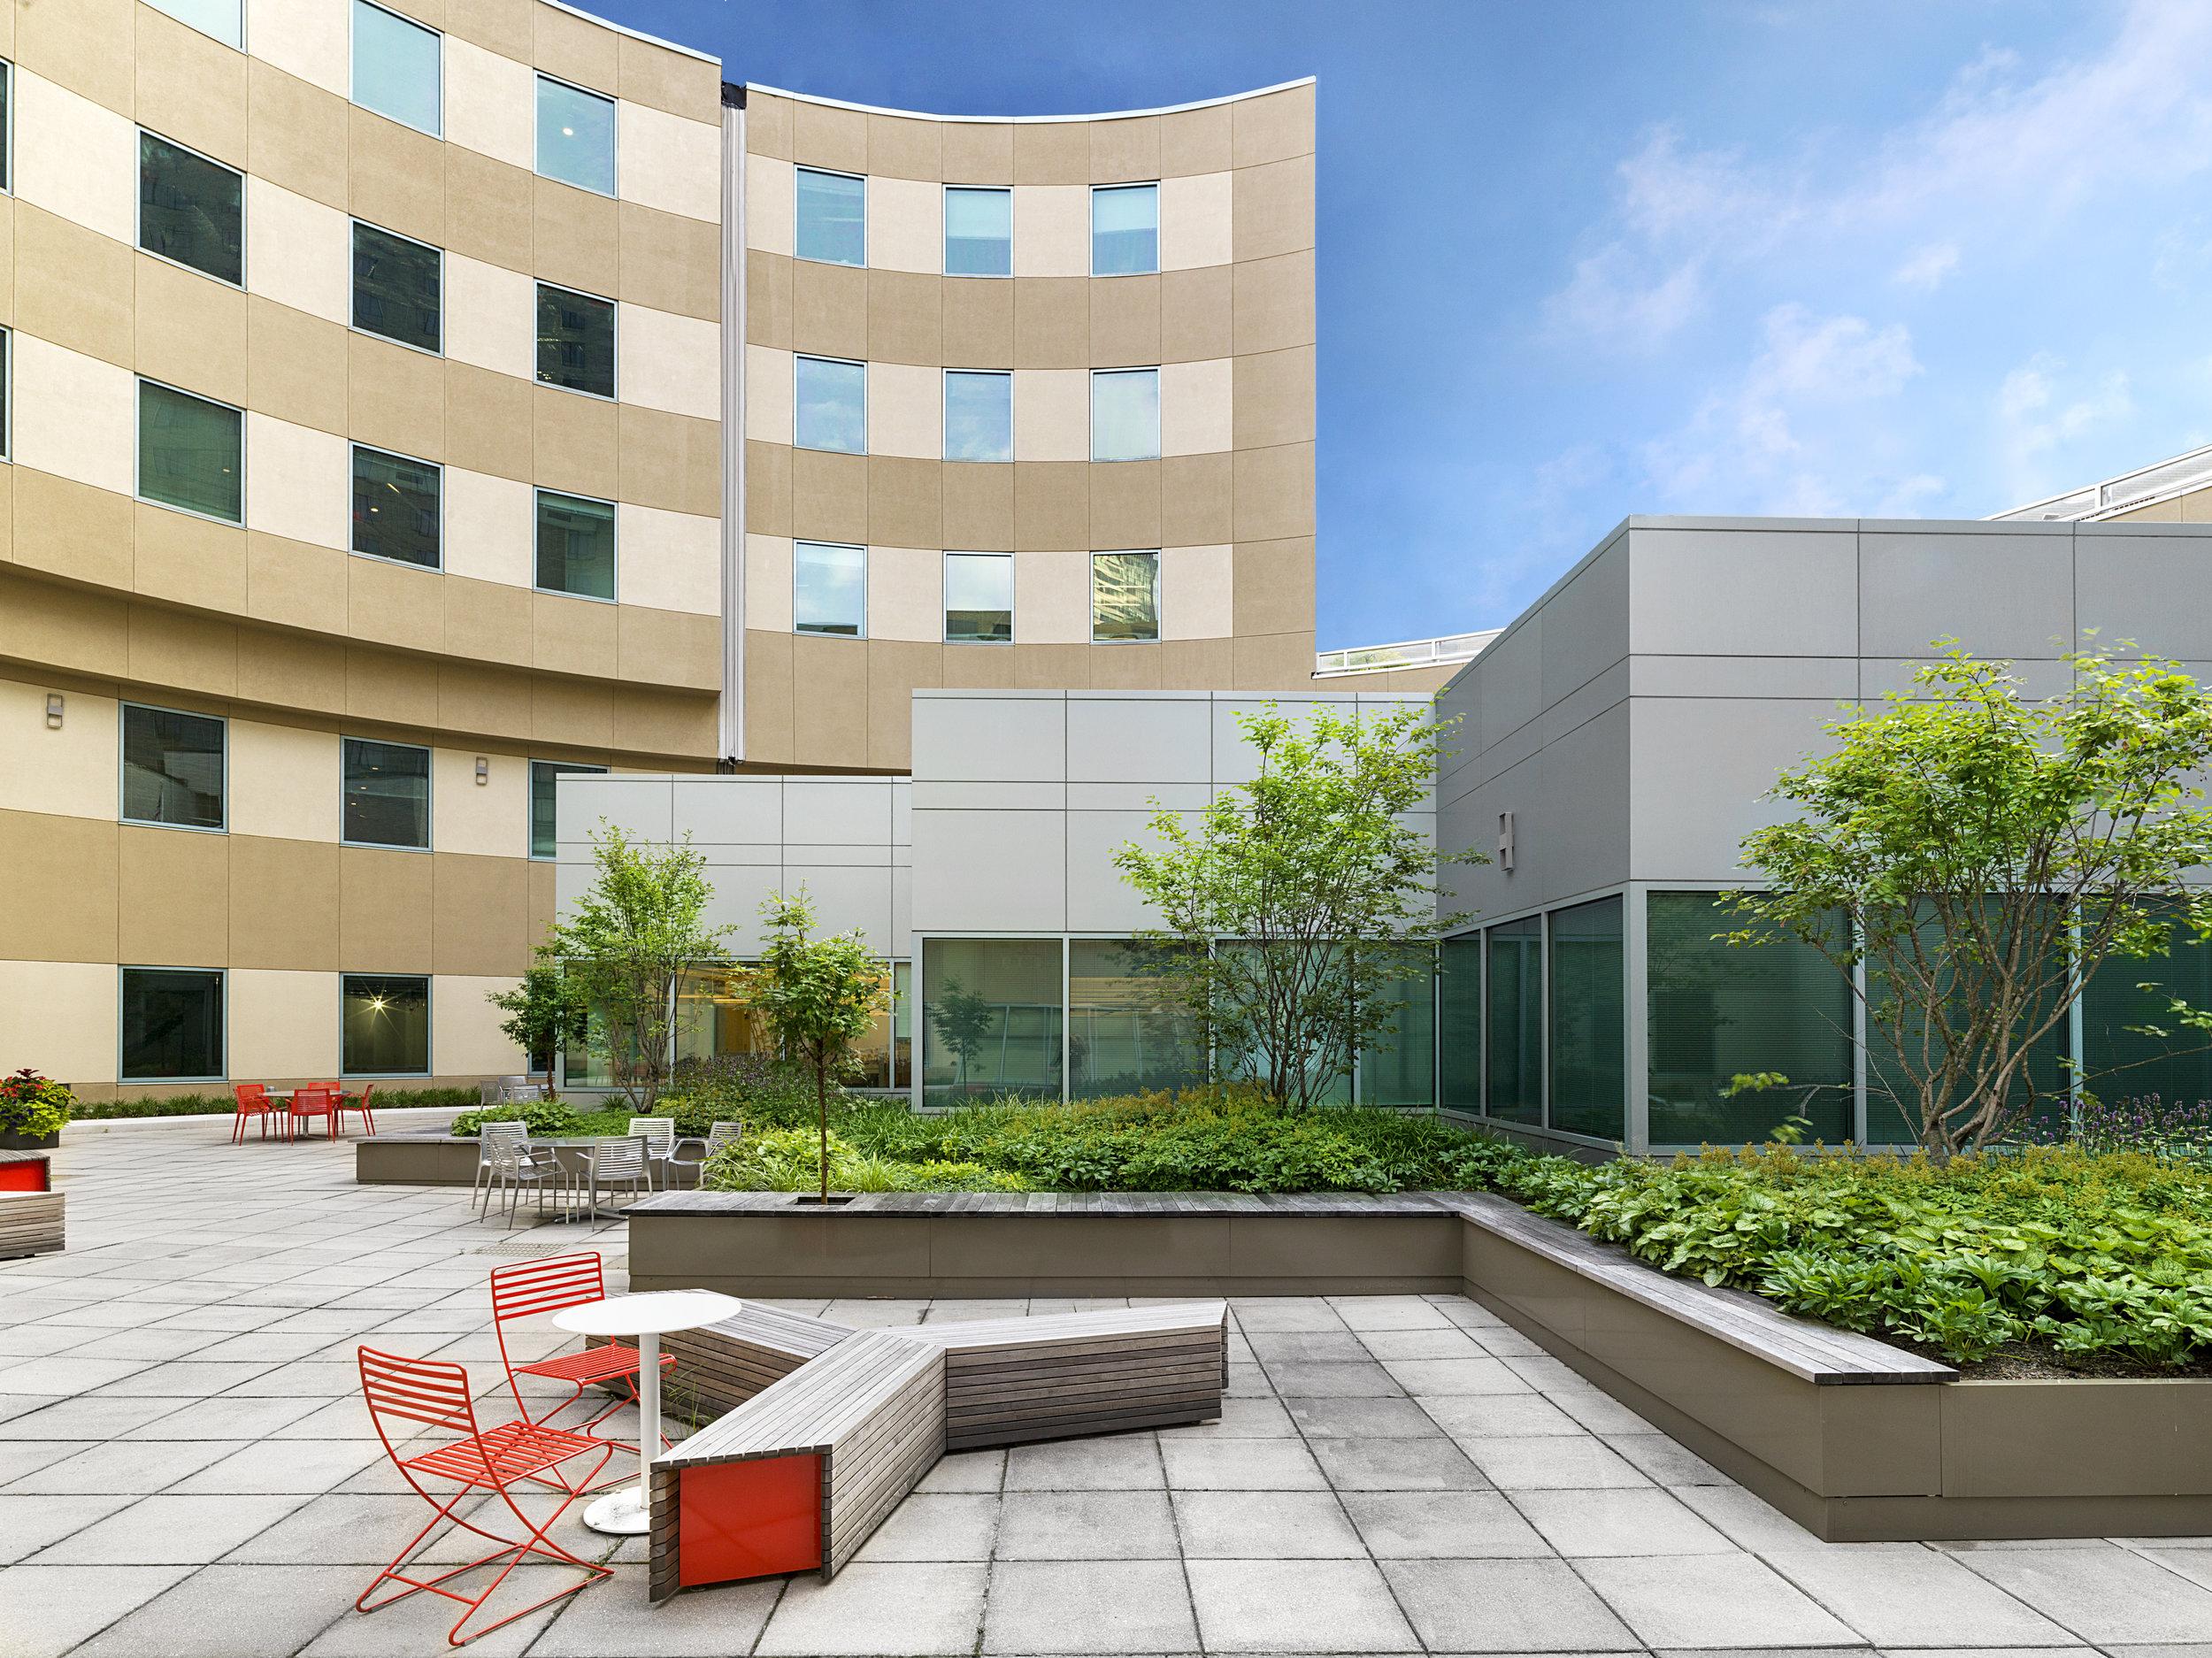 recover-patrick-rogers-photography-intensive-rooftop-garden-2017-3.jpg